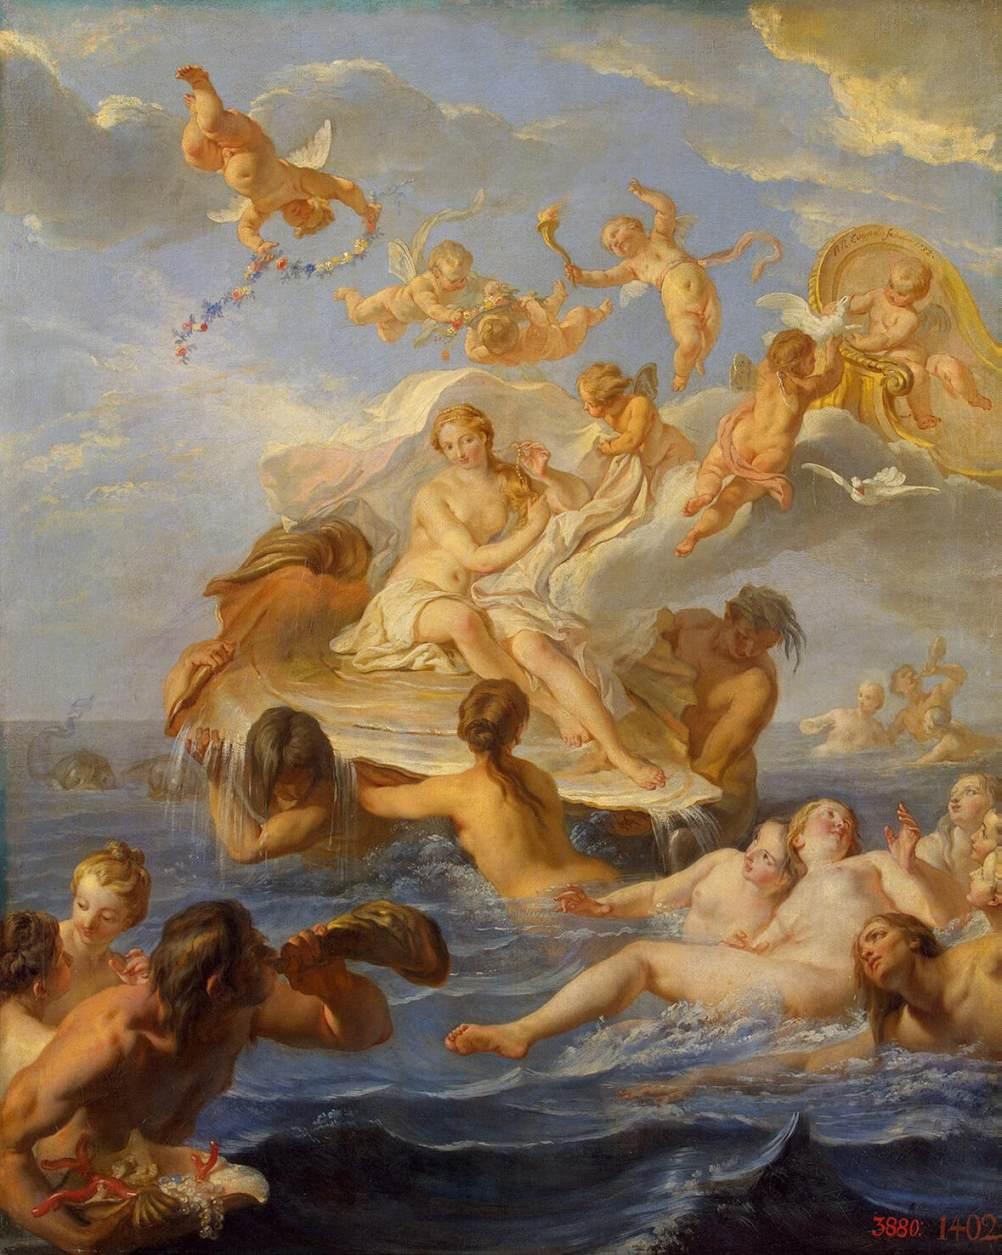 Painting: Coypel Birth of Venus